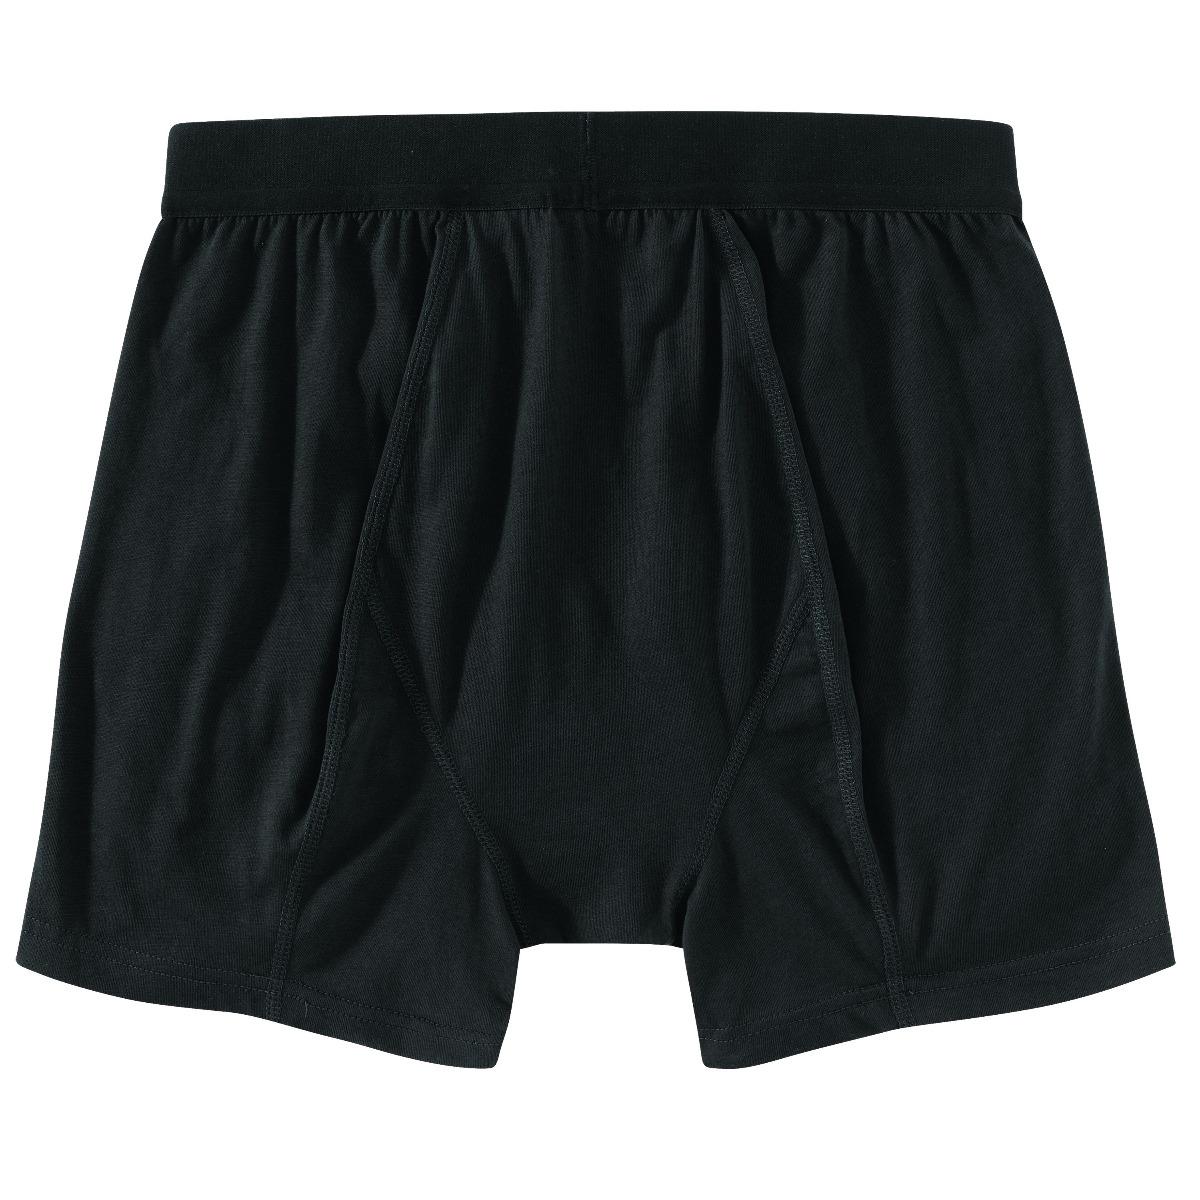 "Carhartt 5"" Basic Boxer Brief 2-Pack"